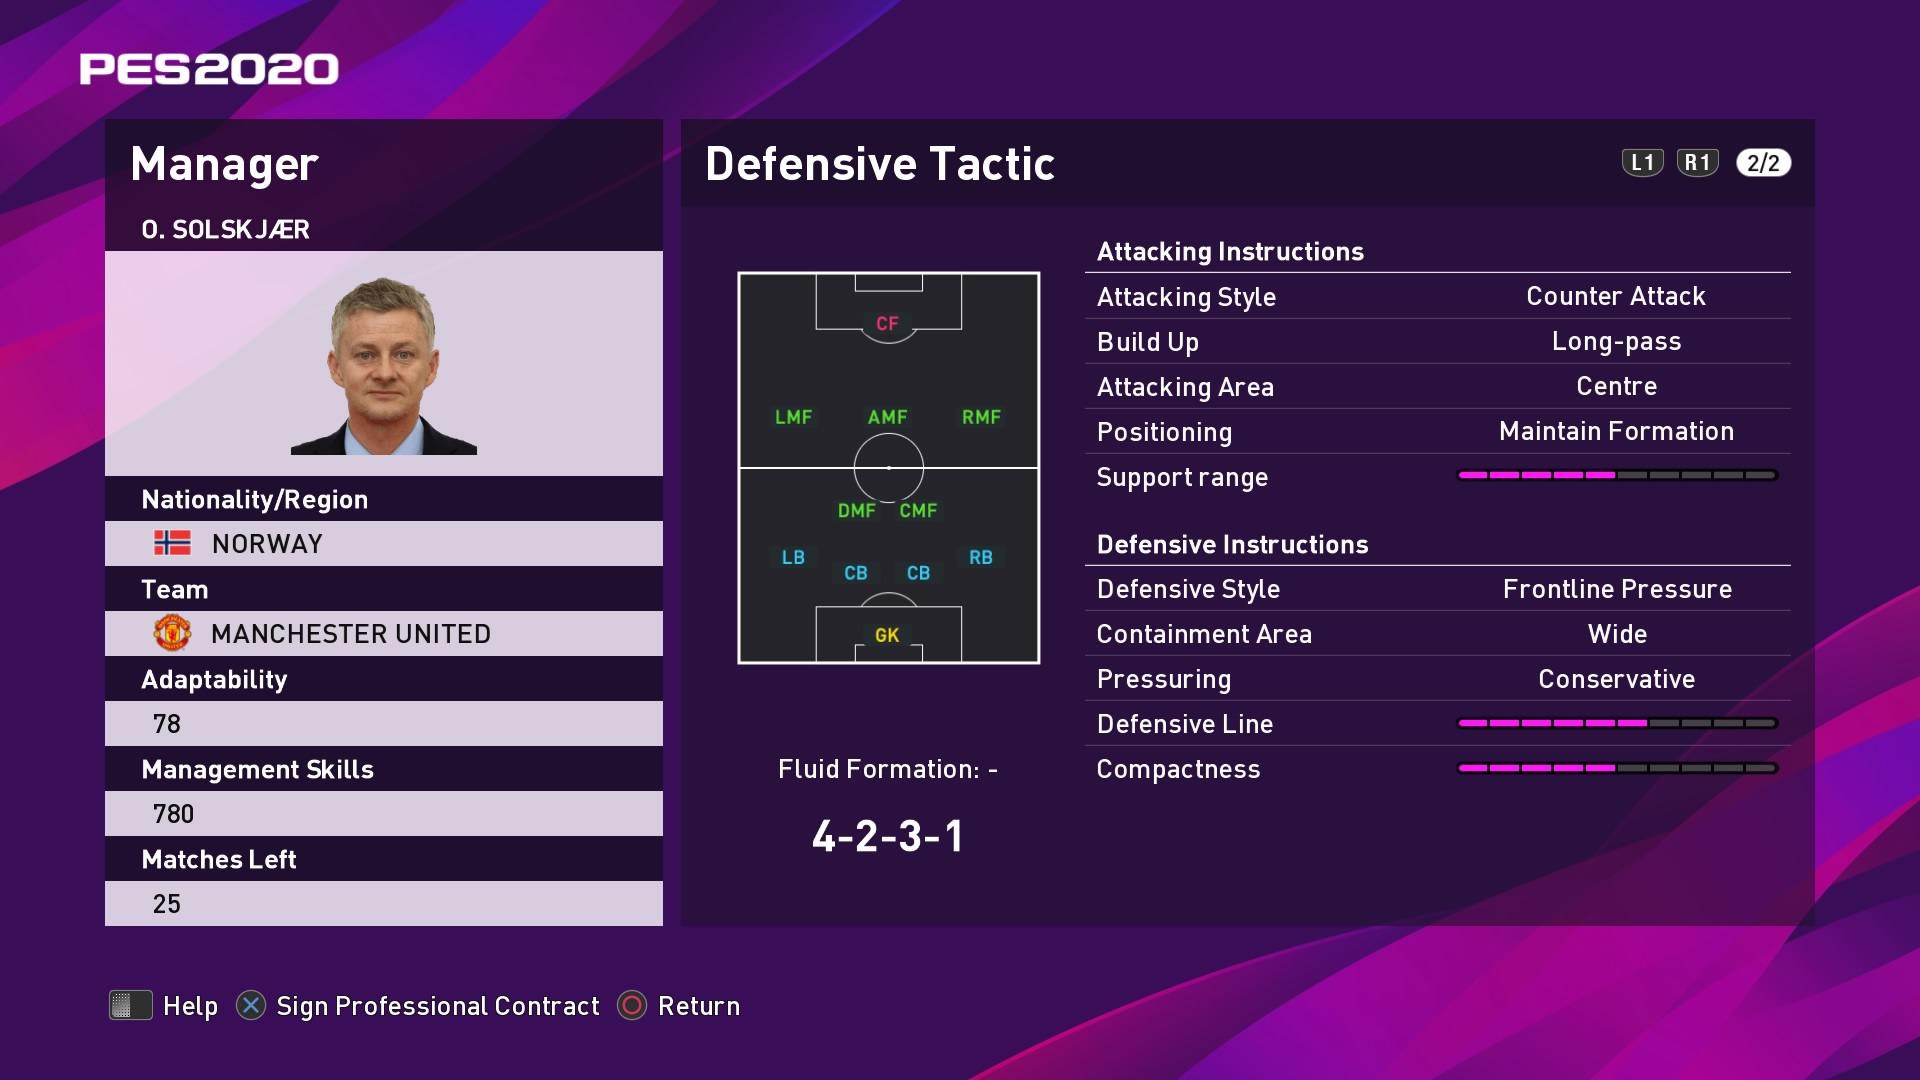 O. Solskjaer (Ole Gunnar Solskjær) Defensive Tactic in PES 2020 myClub